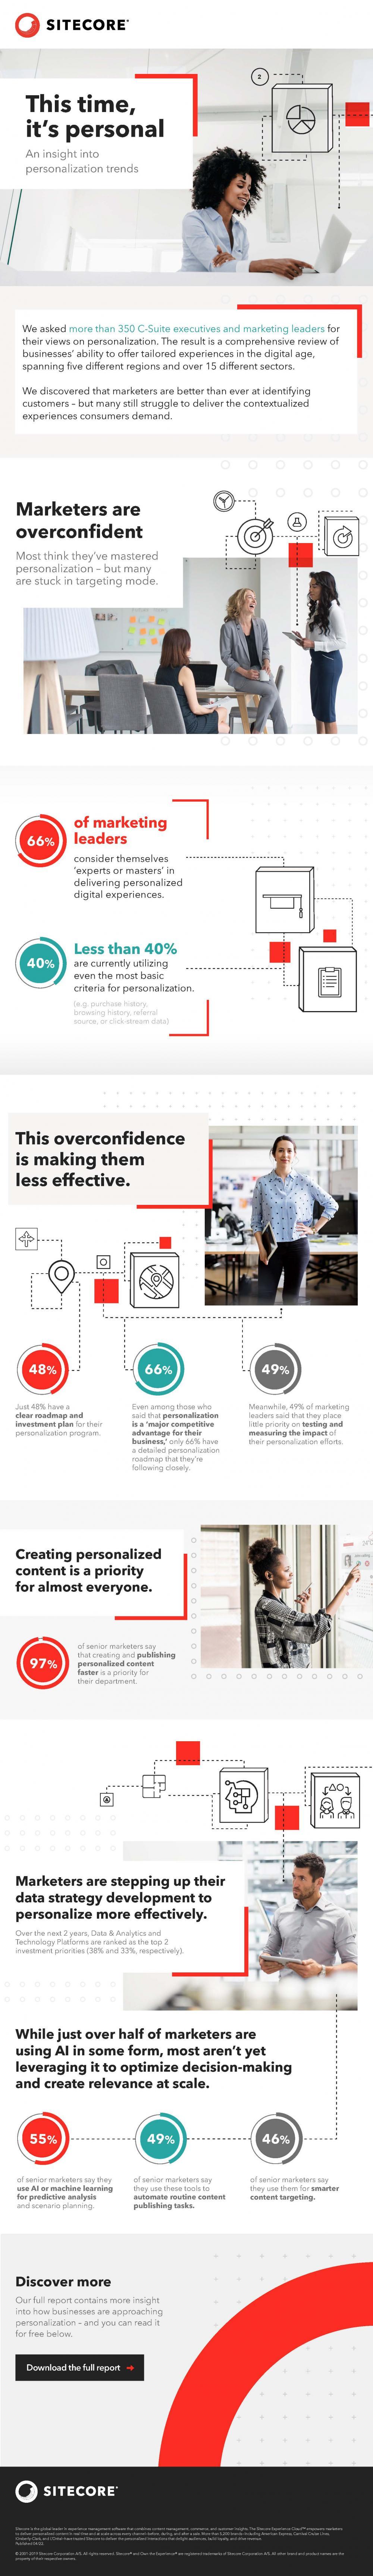 Infographic - personalisation